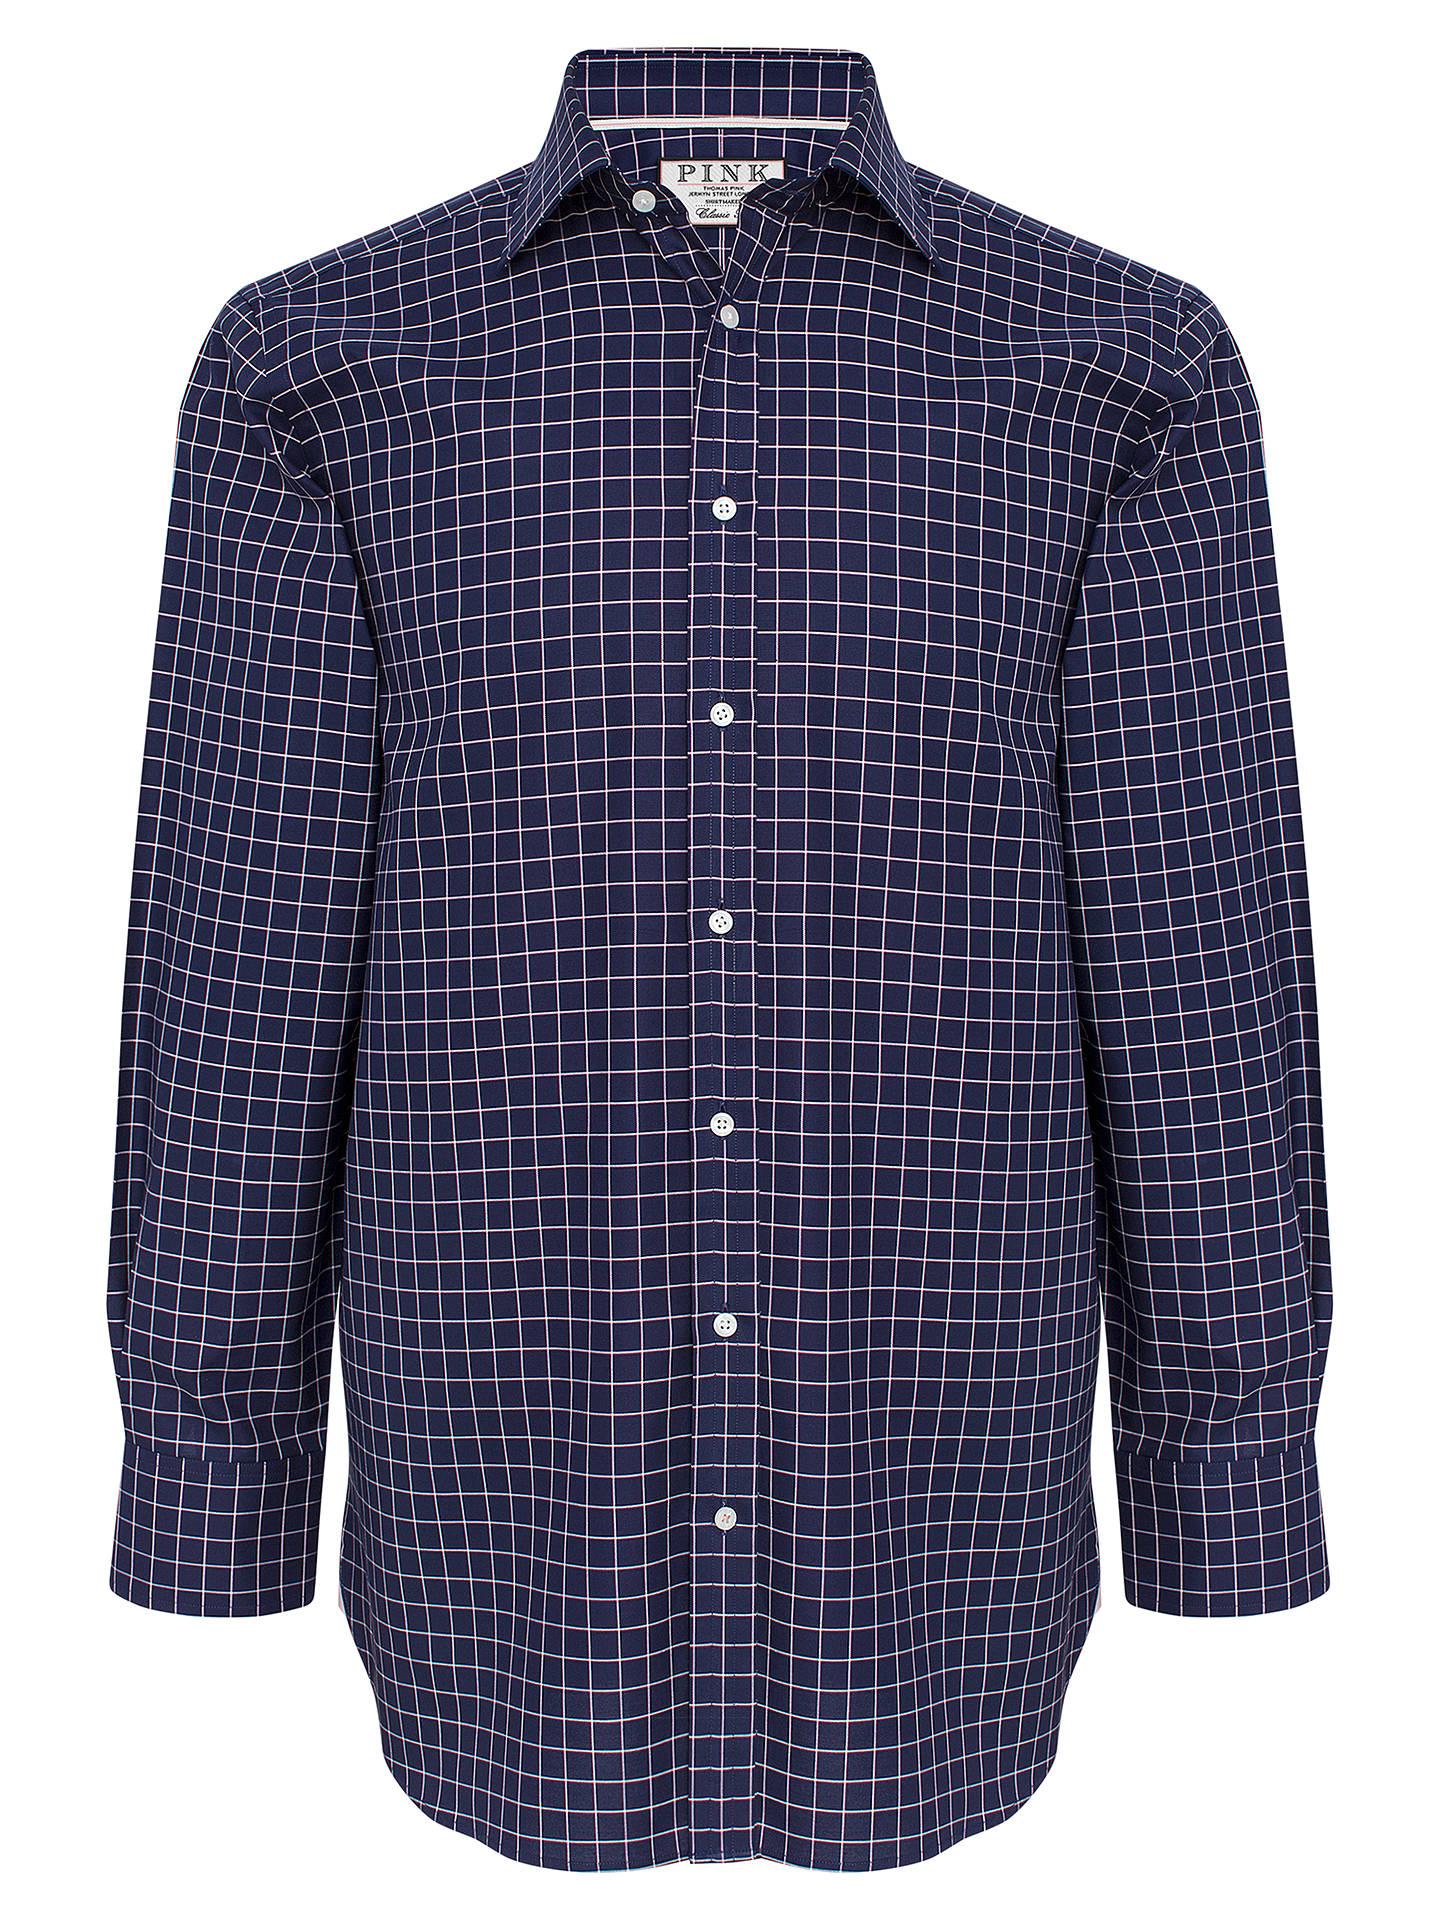 71d6e09b ... Buy Thomas Pink Hadley Check Classic Fit XL Sleeve Shirt, Navy/White, 15